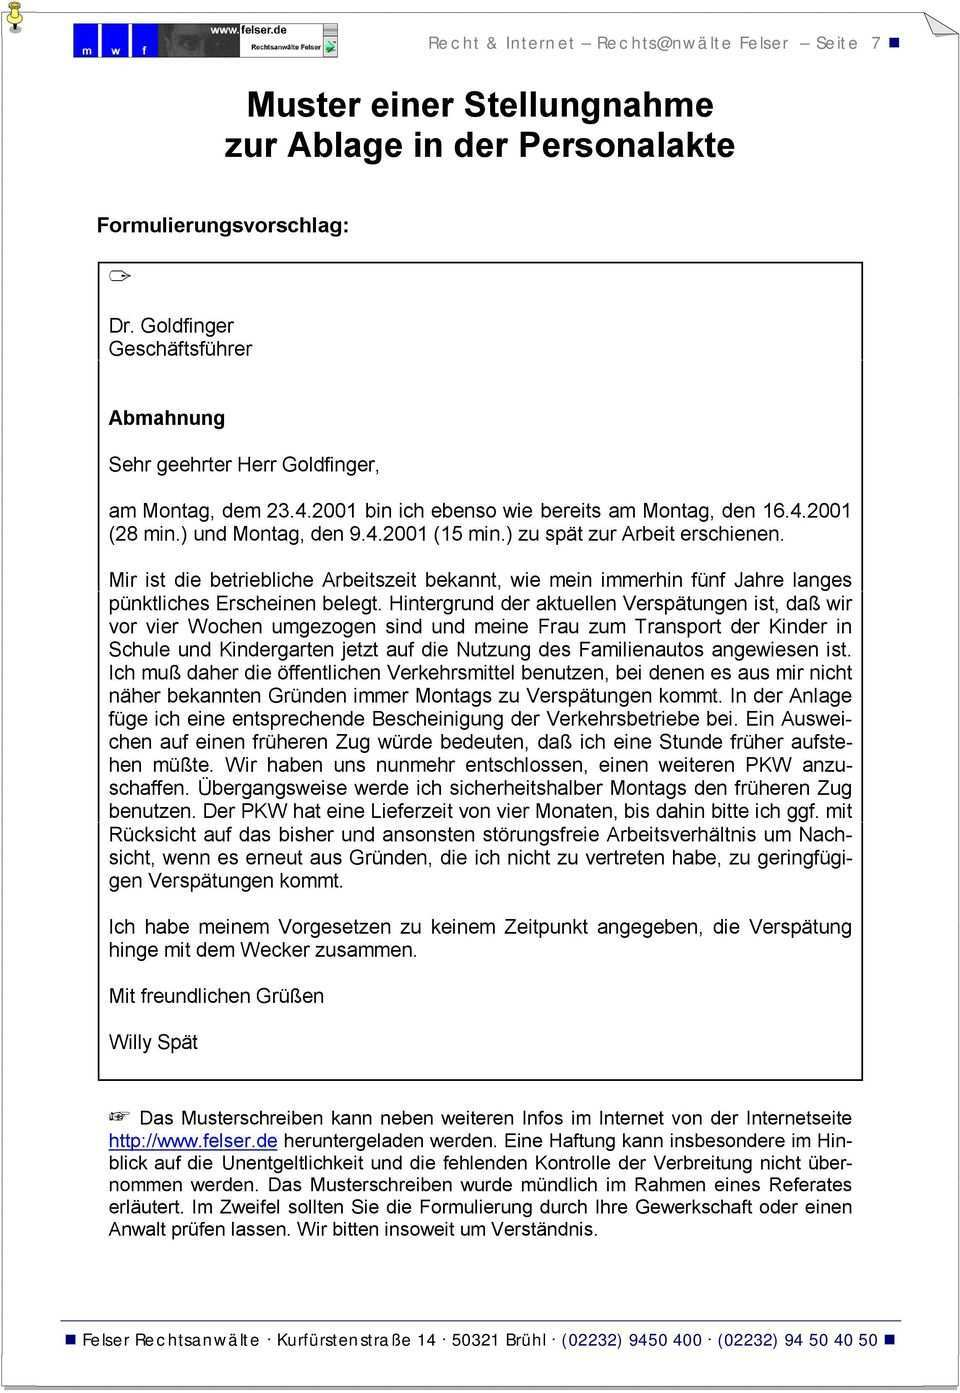 Checkliste Abmahnung Mit Muster Pdf Free Download